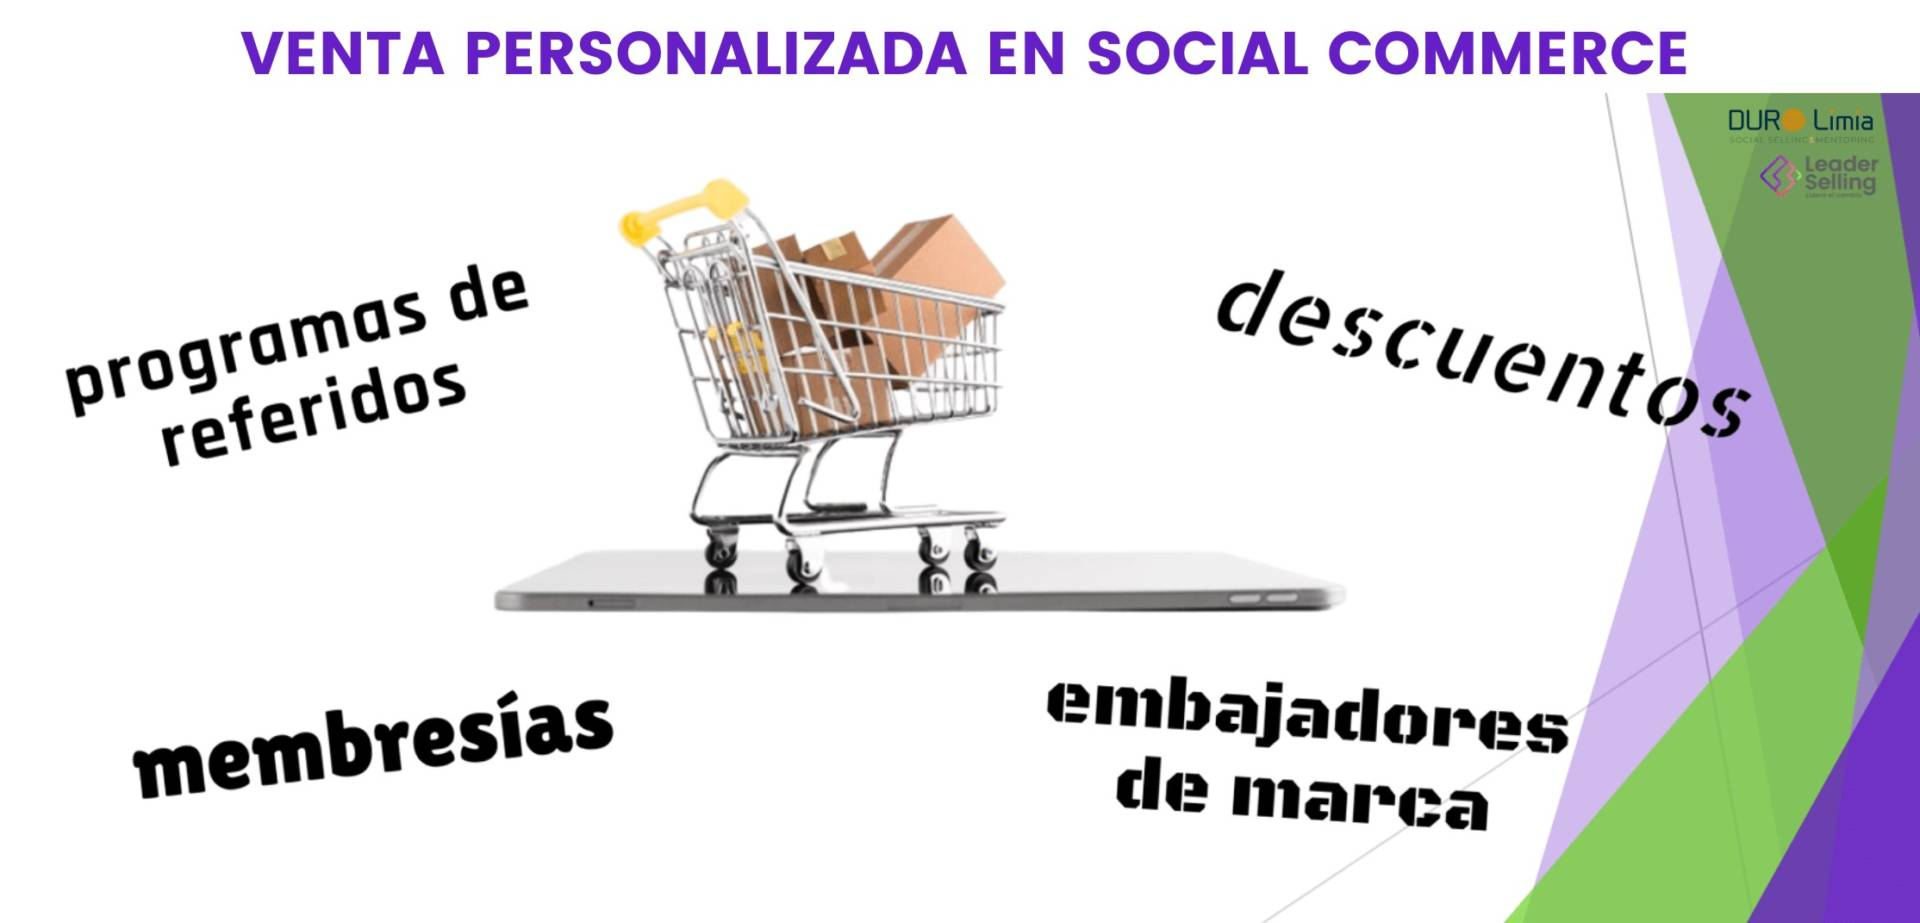 social commerce venta pesonalizada